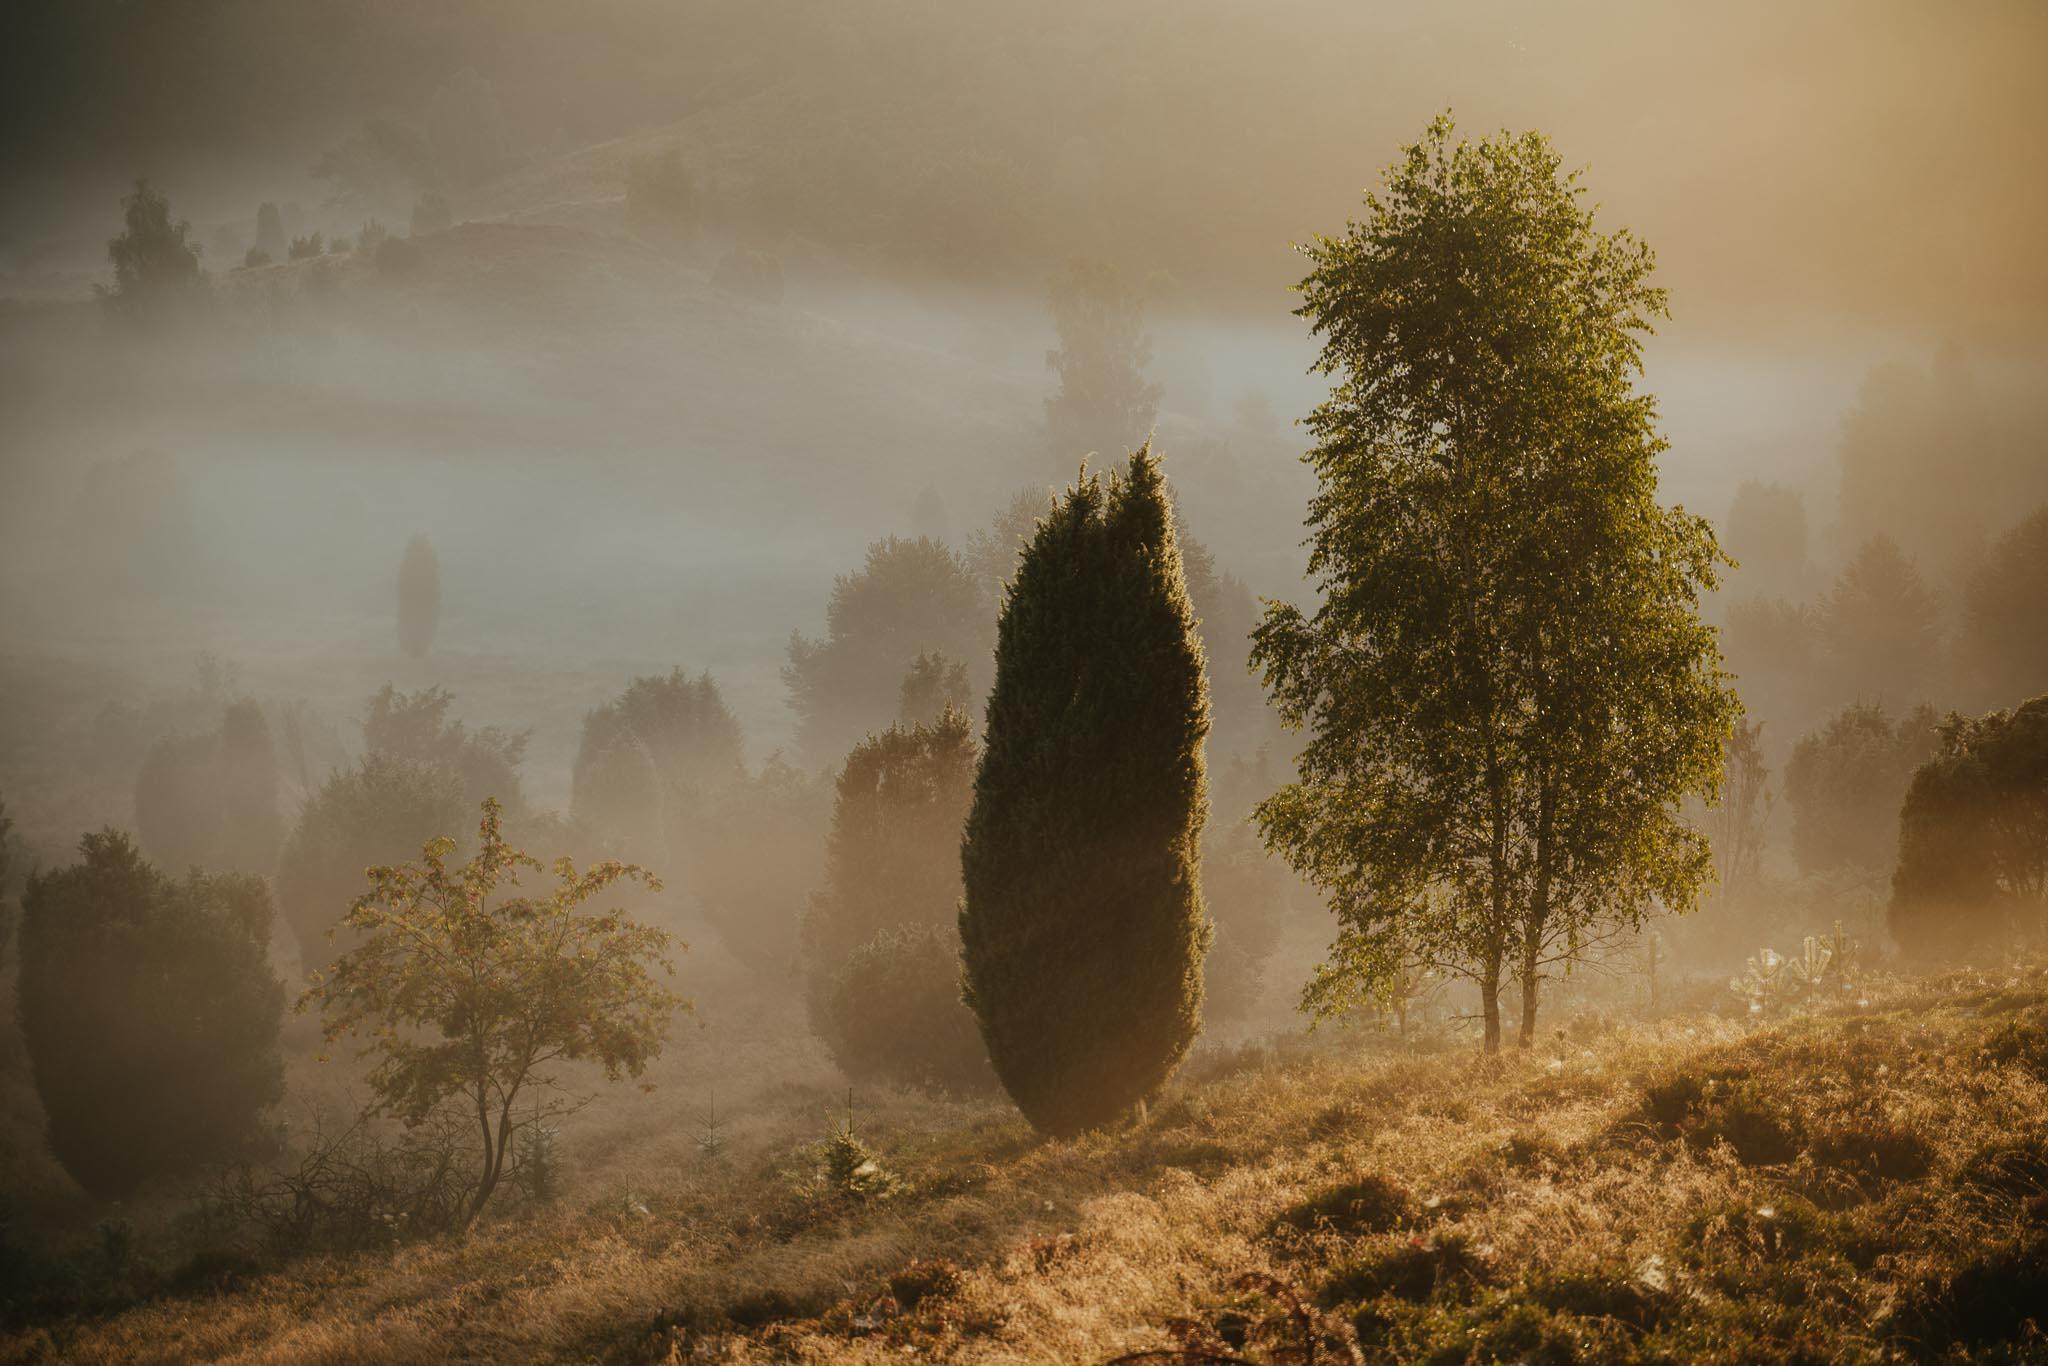 Tree friends - Three trees in the fog at sunrise